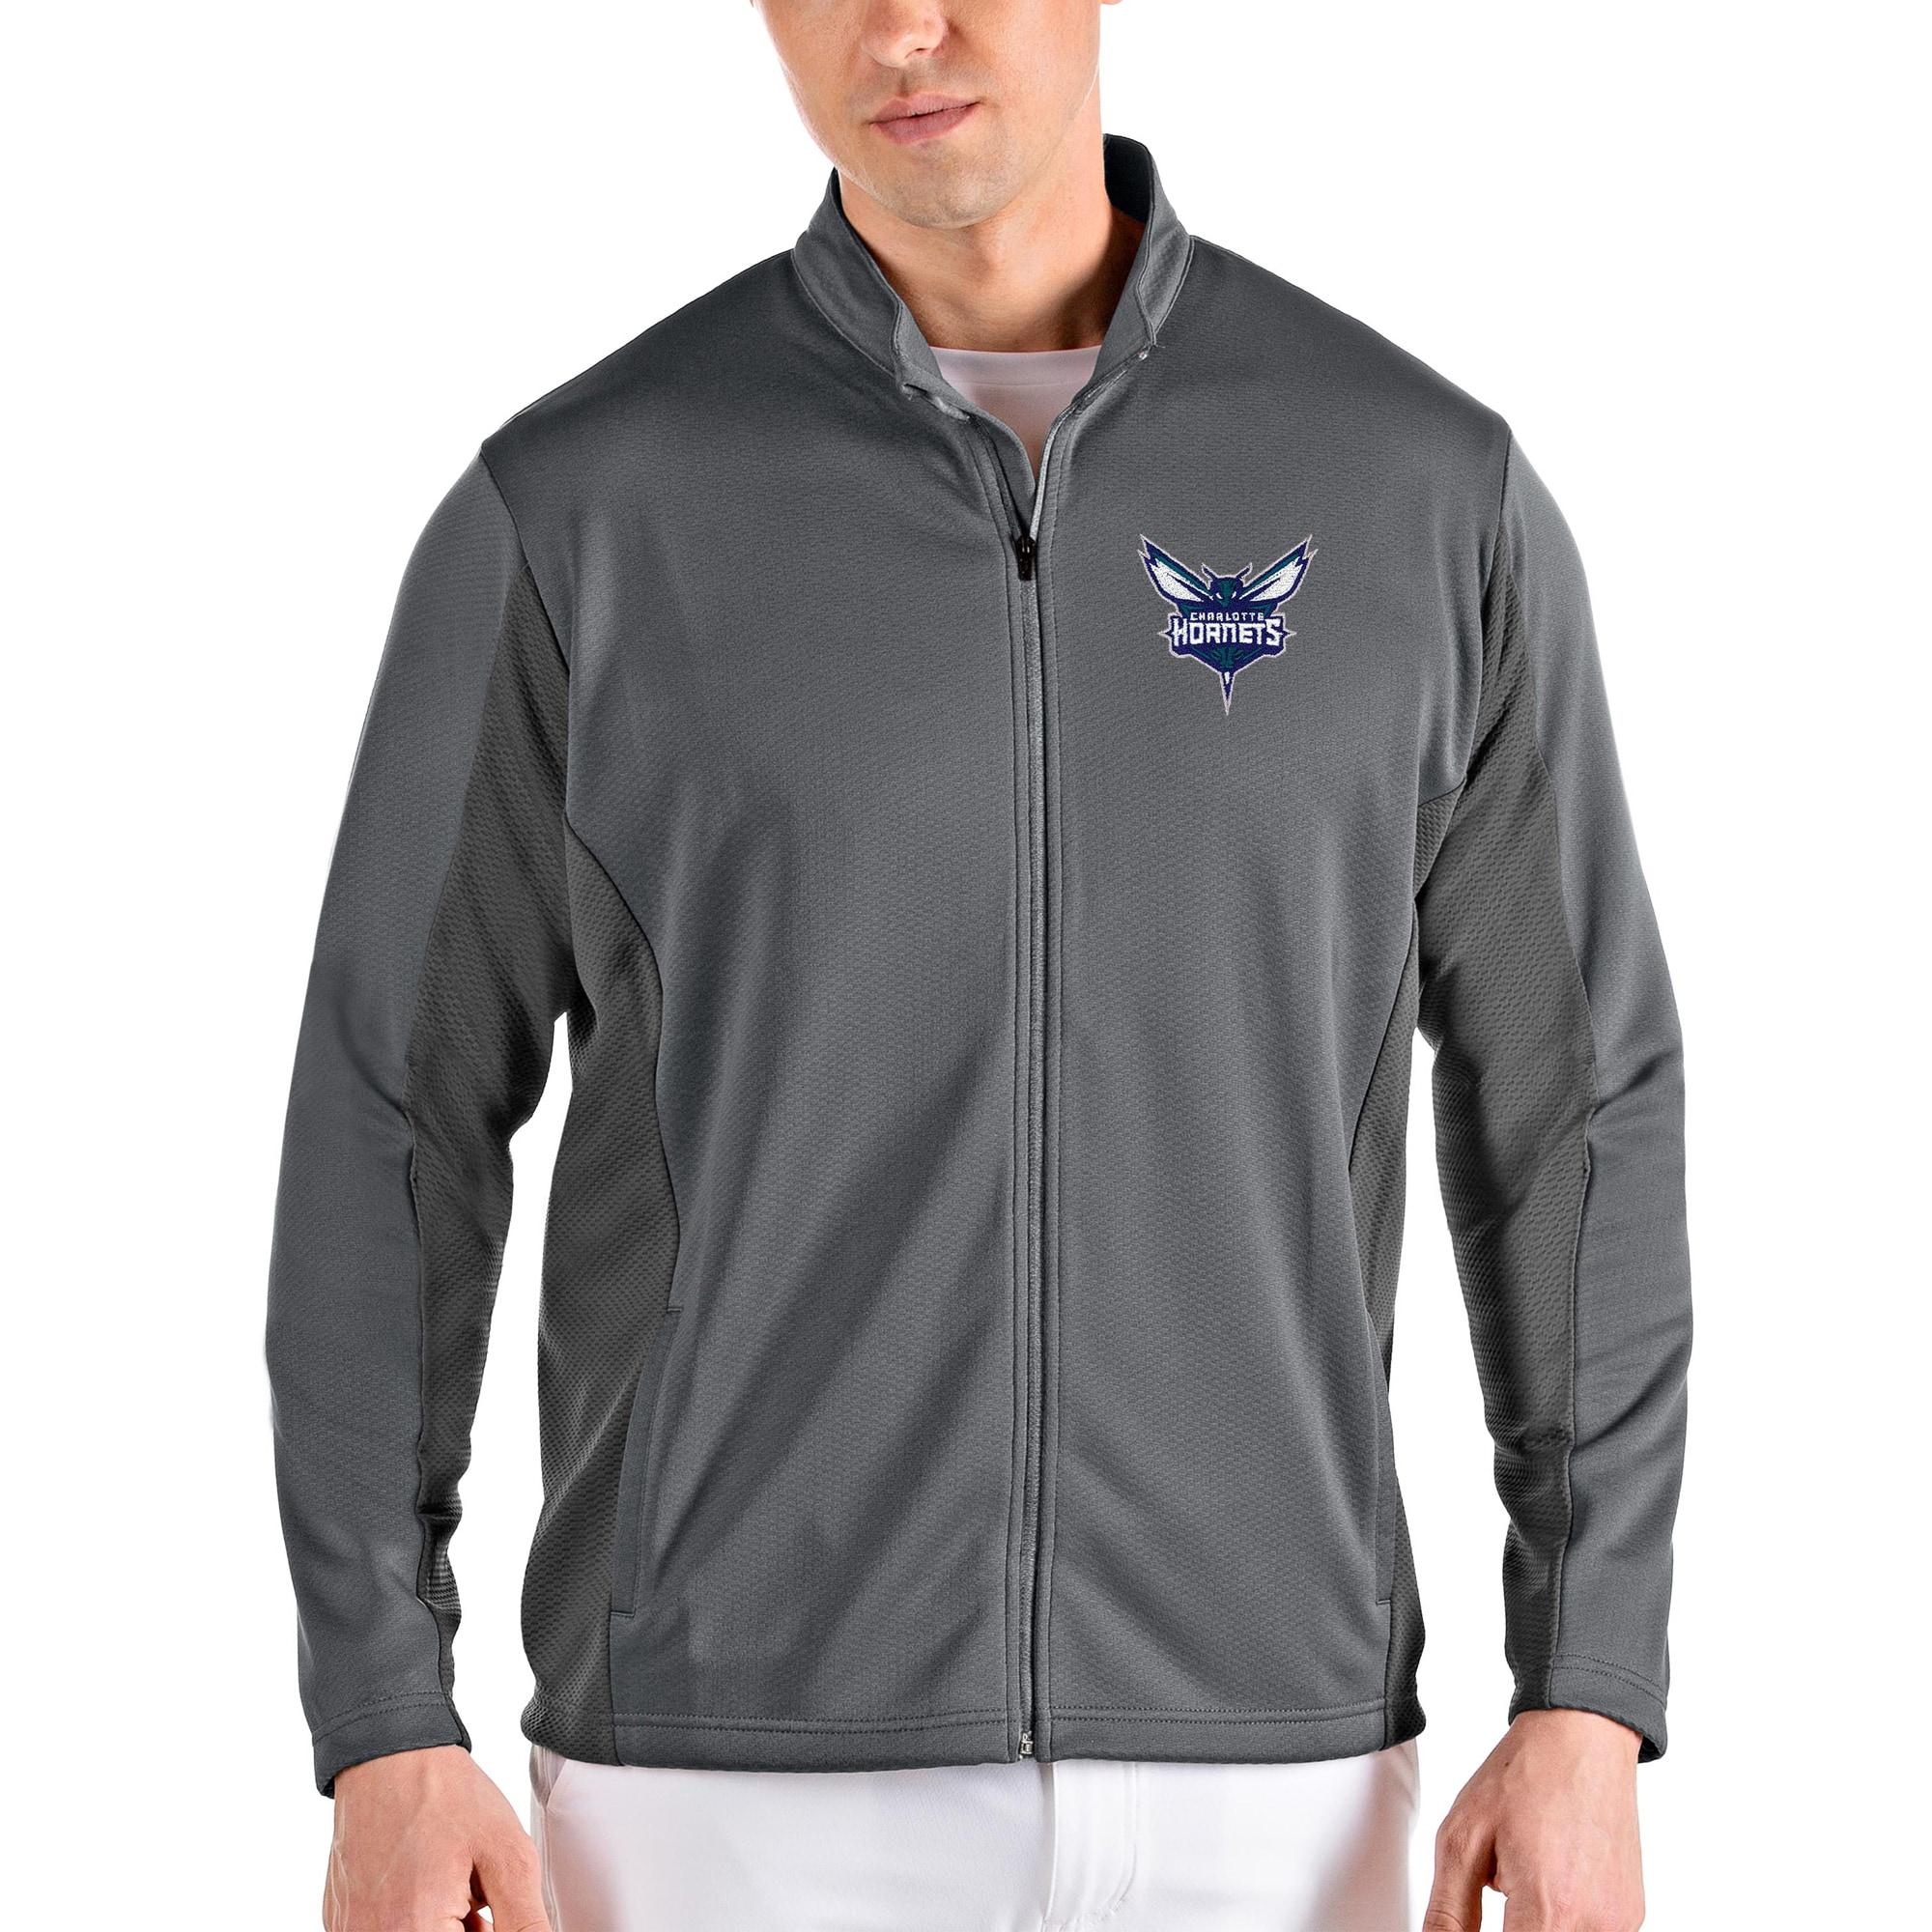 Charlotte Hornets Antigua Passage Full-Zip Jacket - Charcoal/Gray